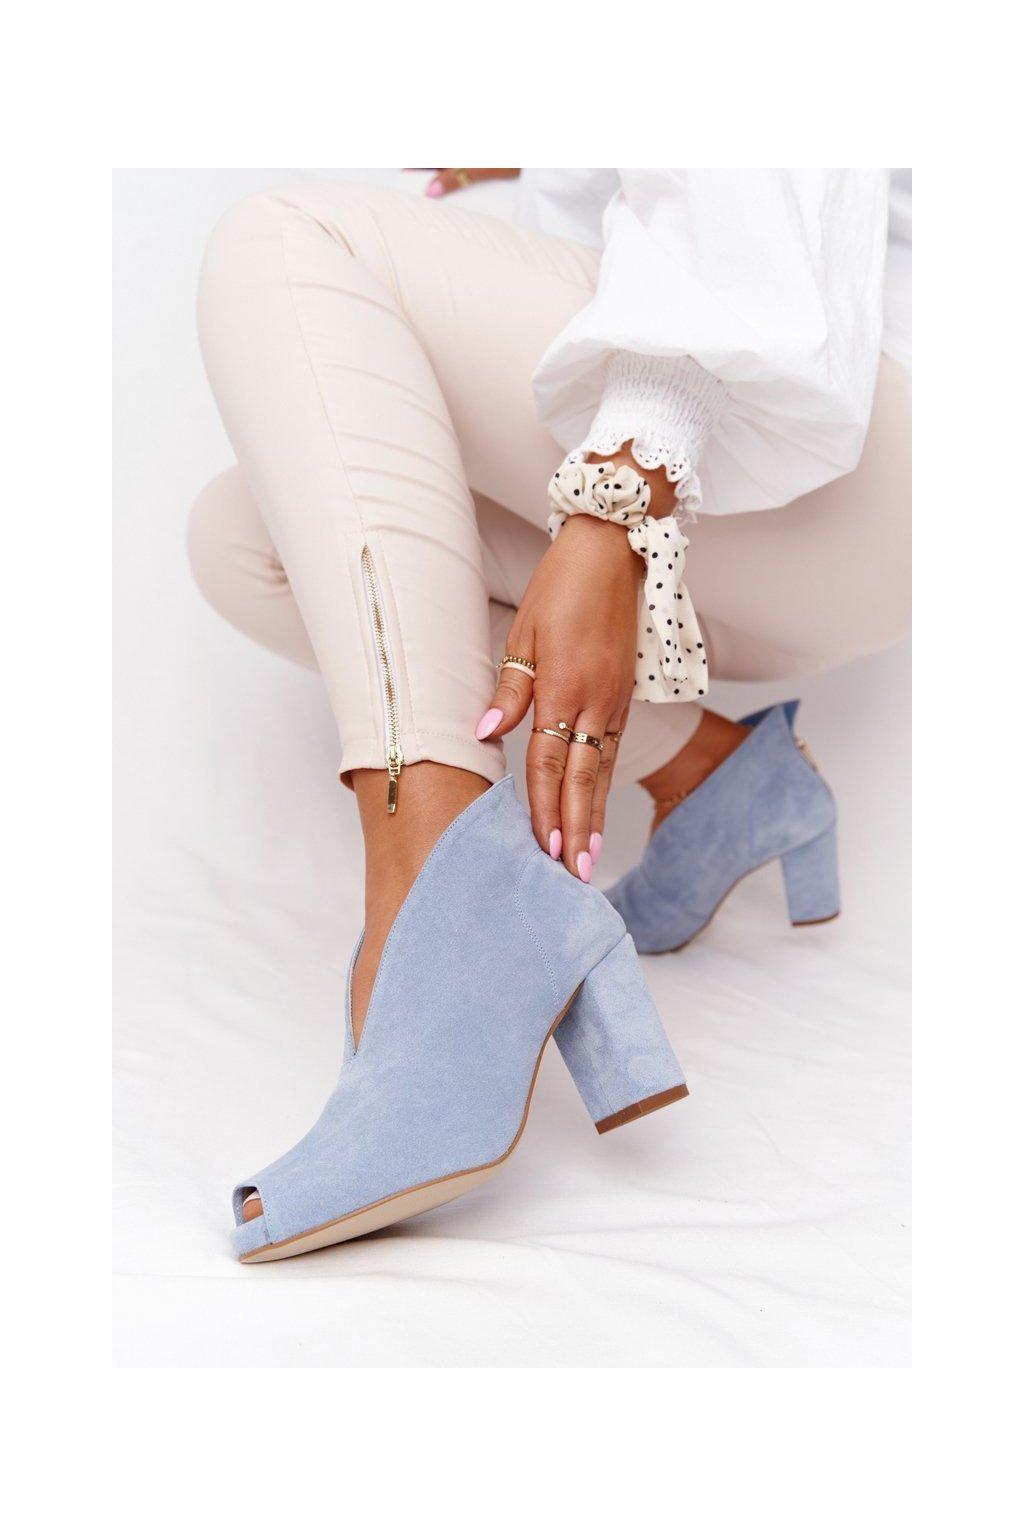 Členkové topánky na podpätku farba modrá kód obuvi 1243 BLUE.WELUR